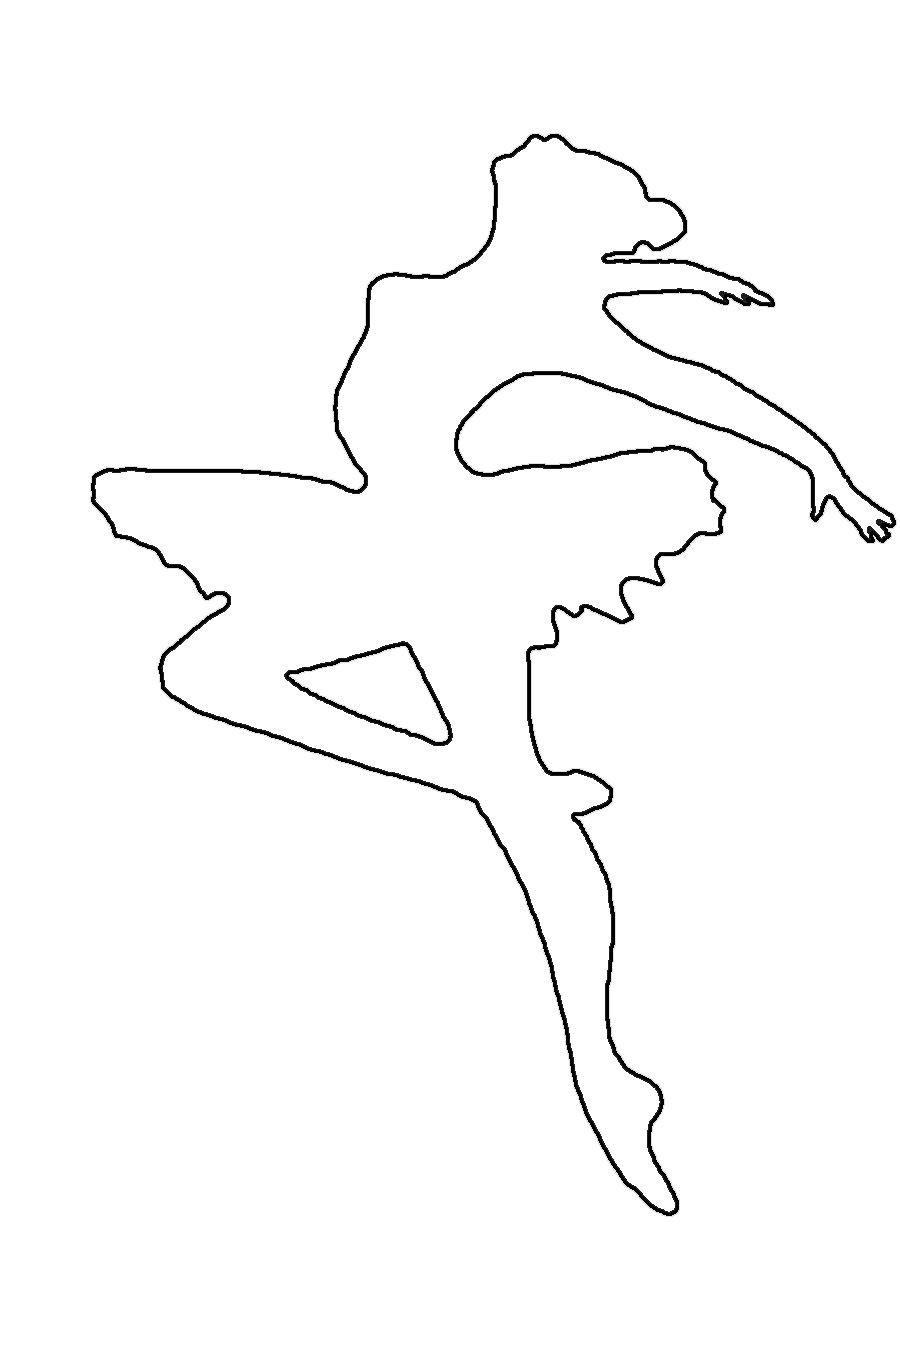 балерины своими руками из бумаги трафарет